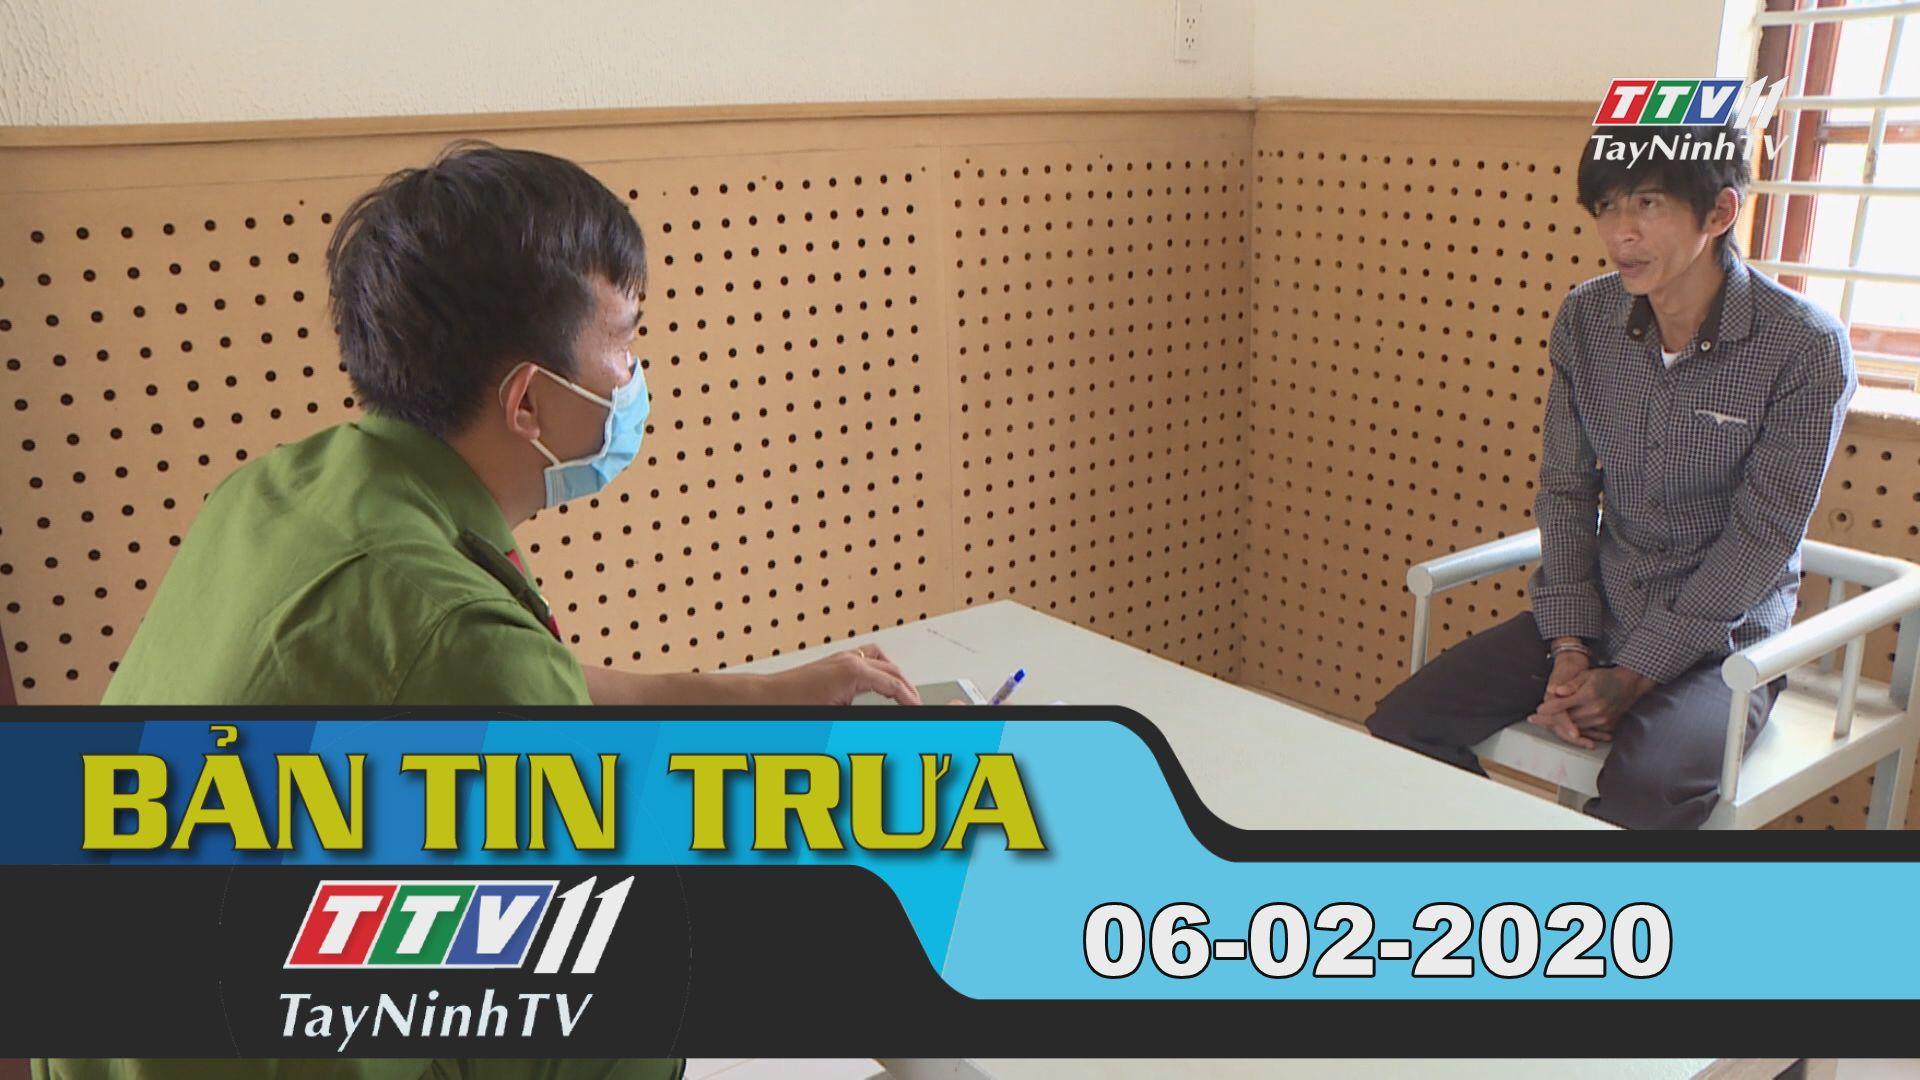 Bản tin trưa 06-02-2020 | Tin tức hôm nay | TayNinhTV